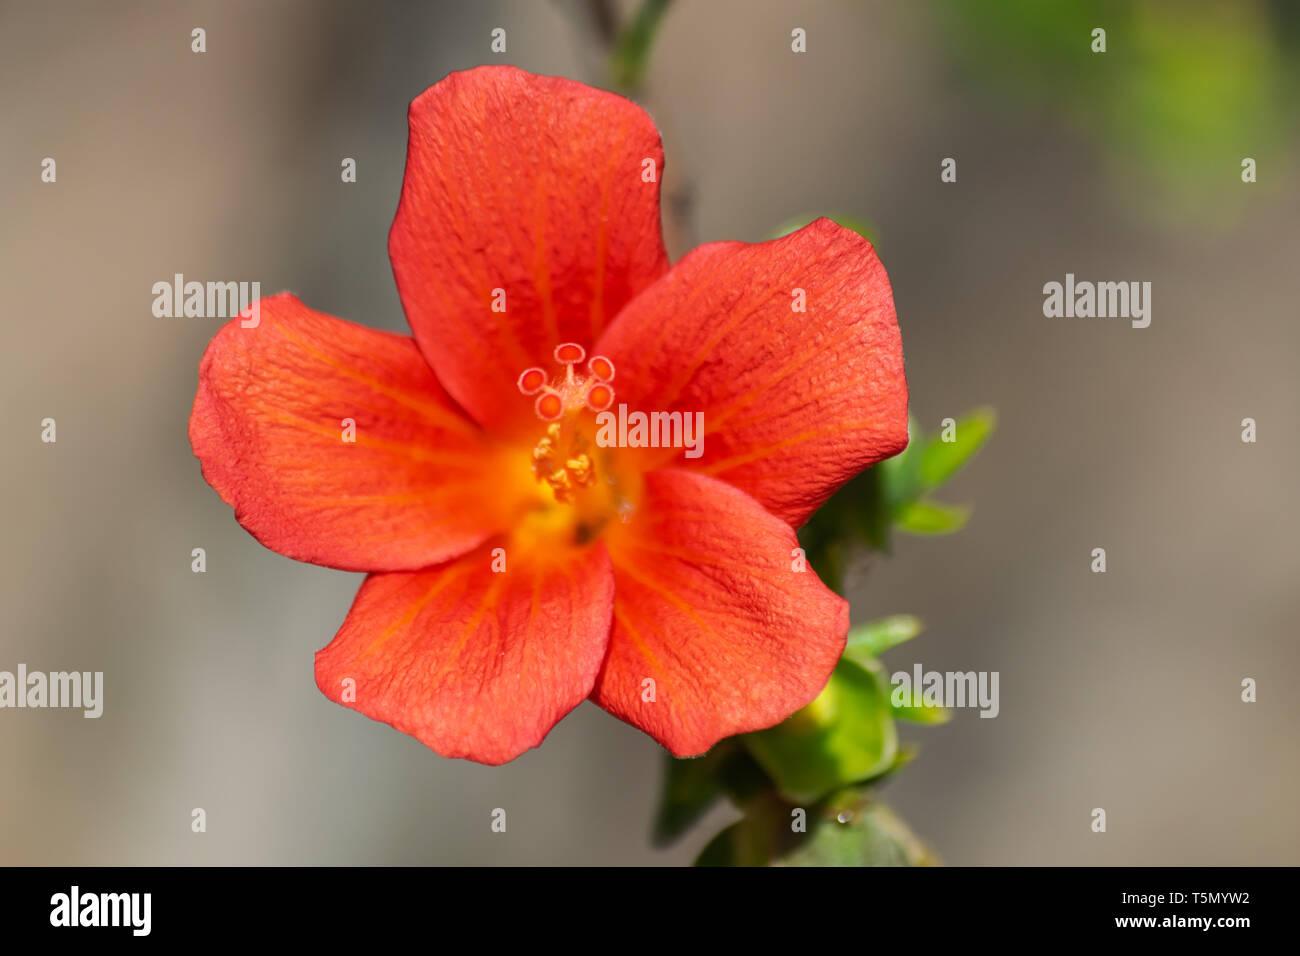 Red orange hibiscus boryanus flower, blooming with sunlight, botanic garden, Tenerife, Canary islands, Spain - Stock Image